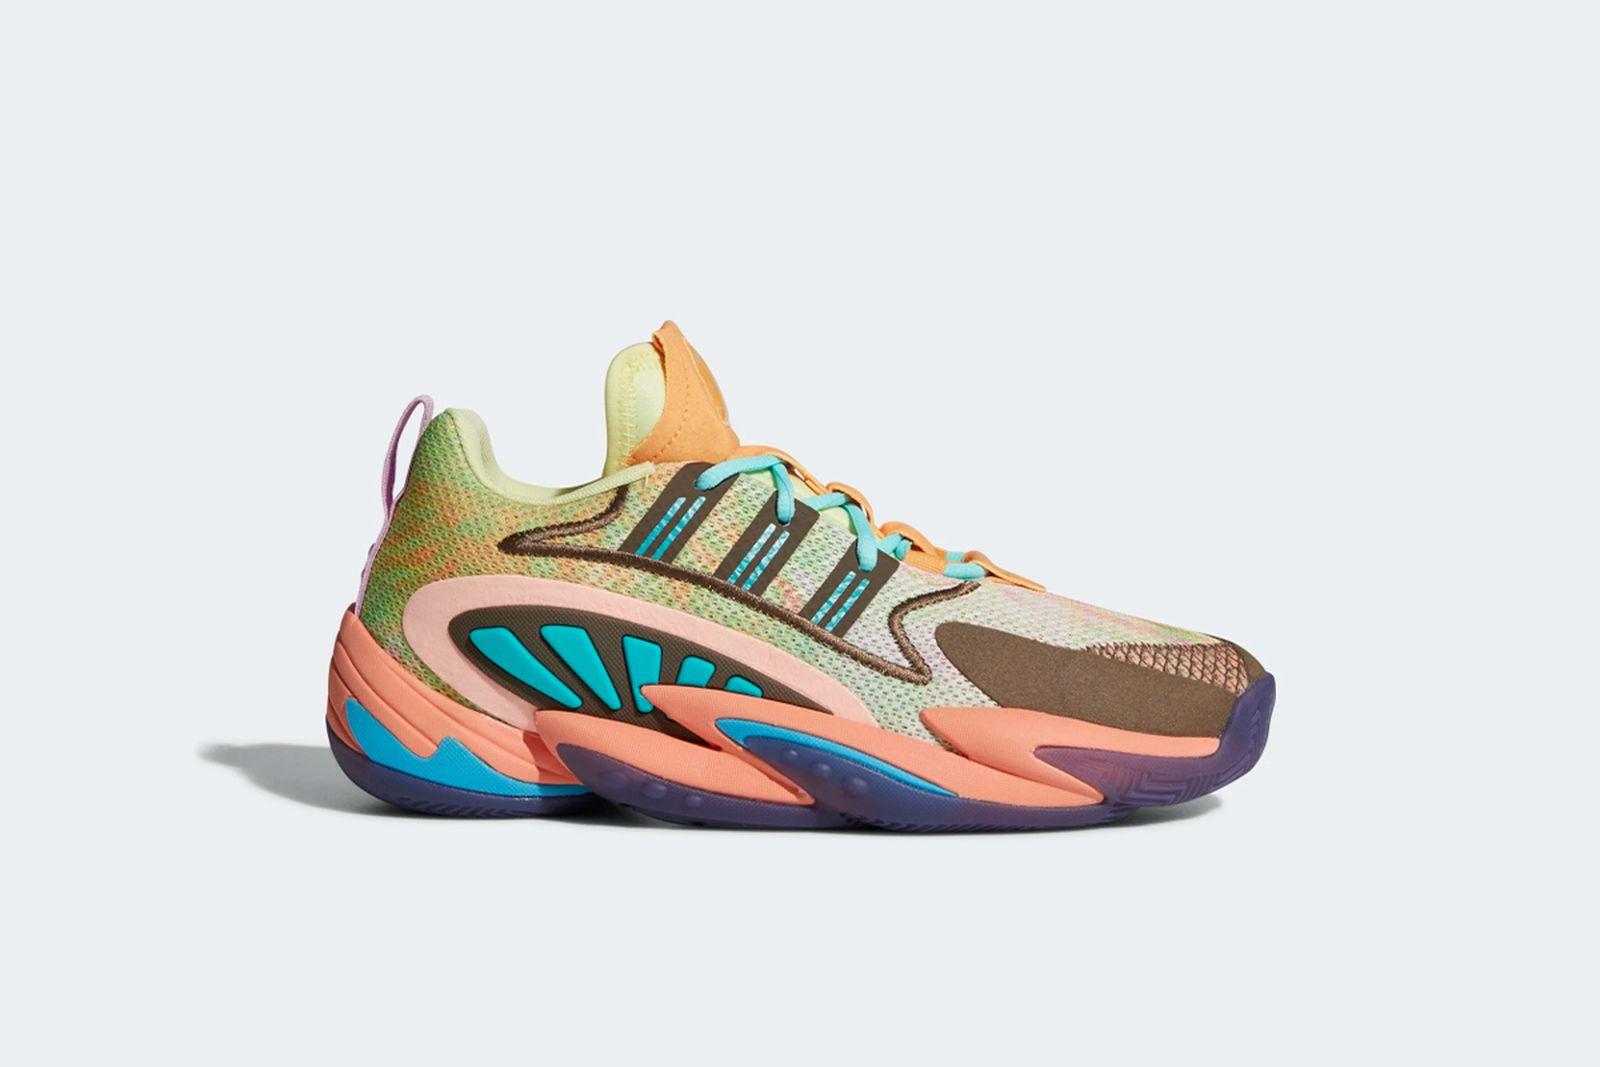 Pharrell Williams x Adidas 2020 Crazy BYW 2.0 Sneaker